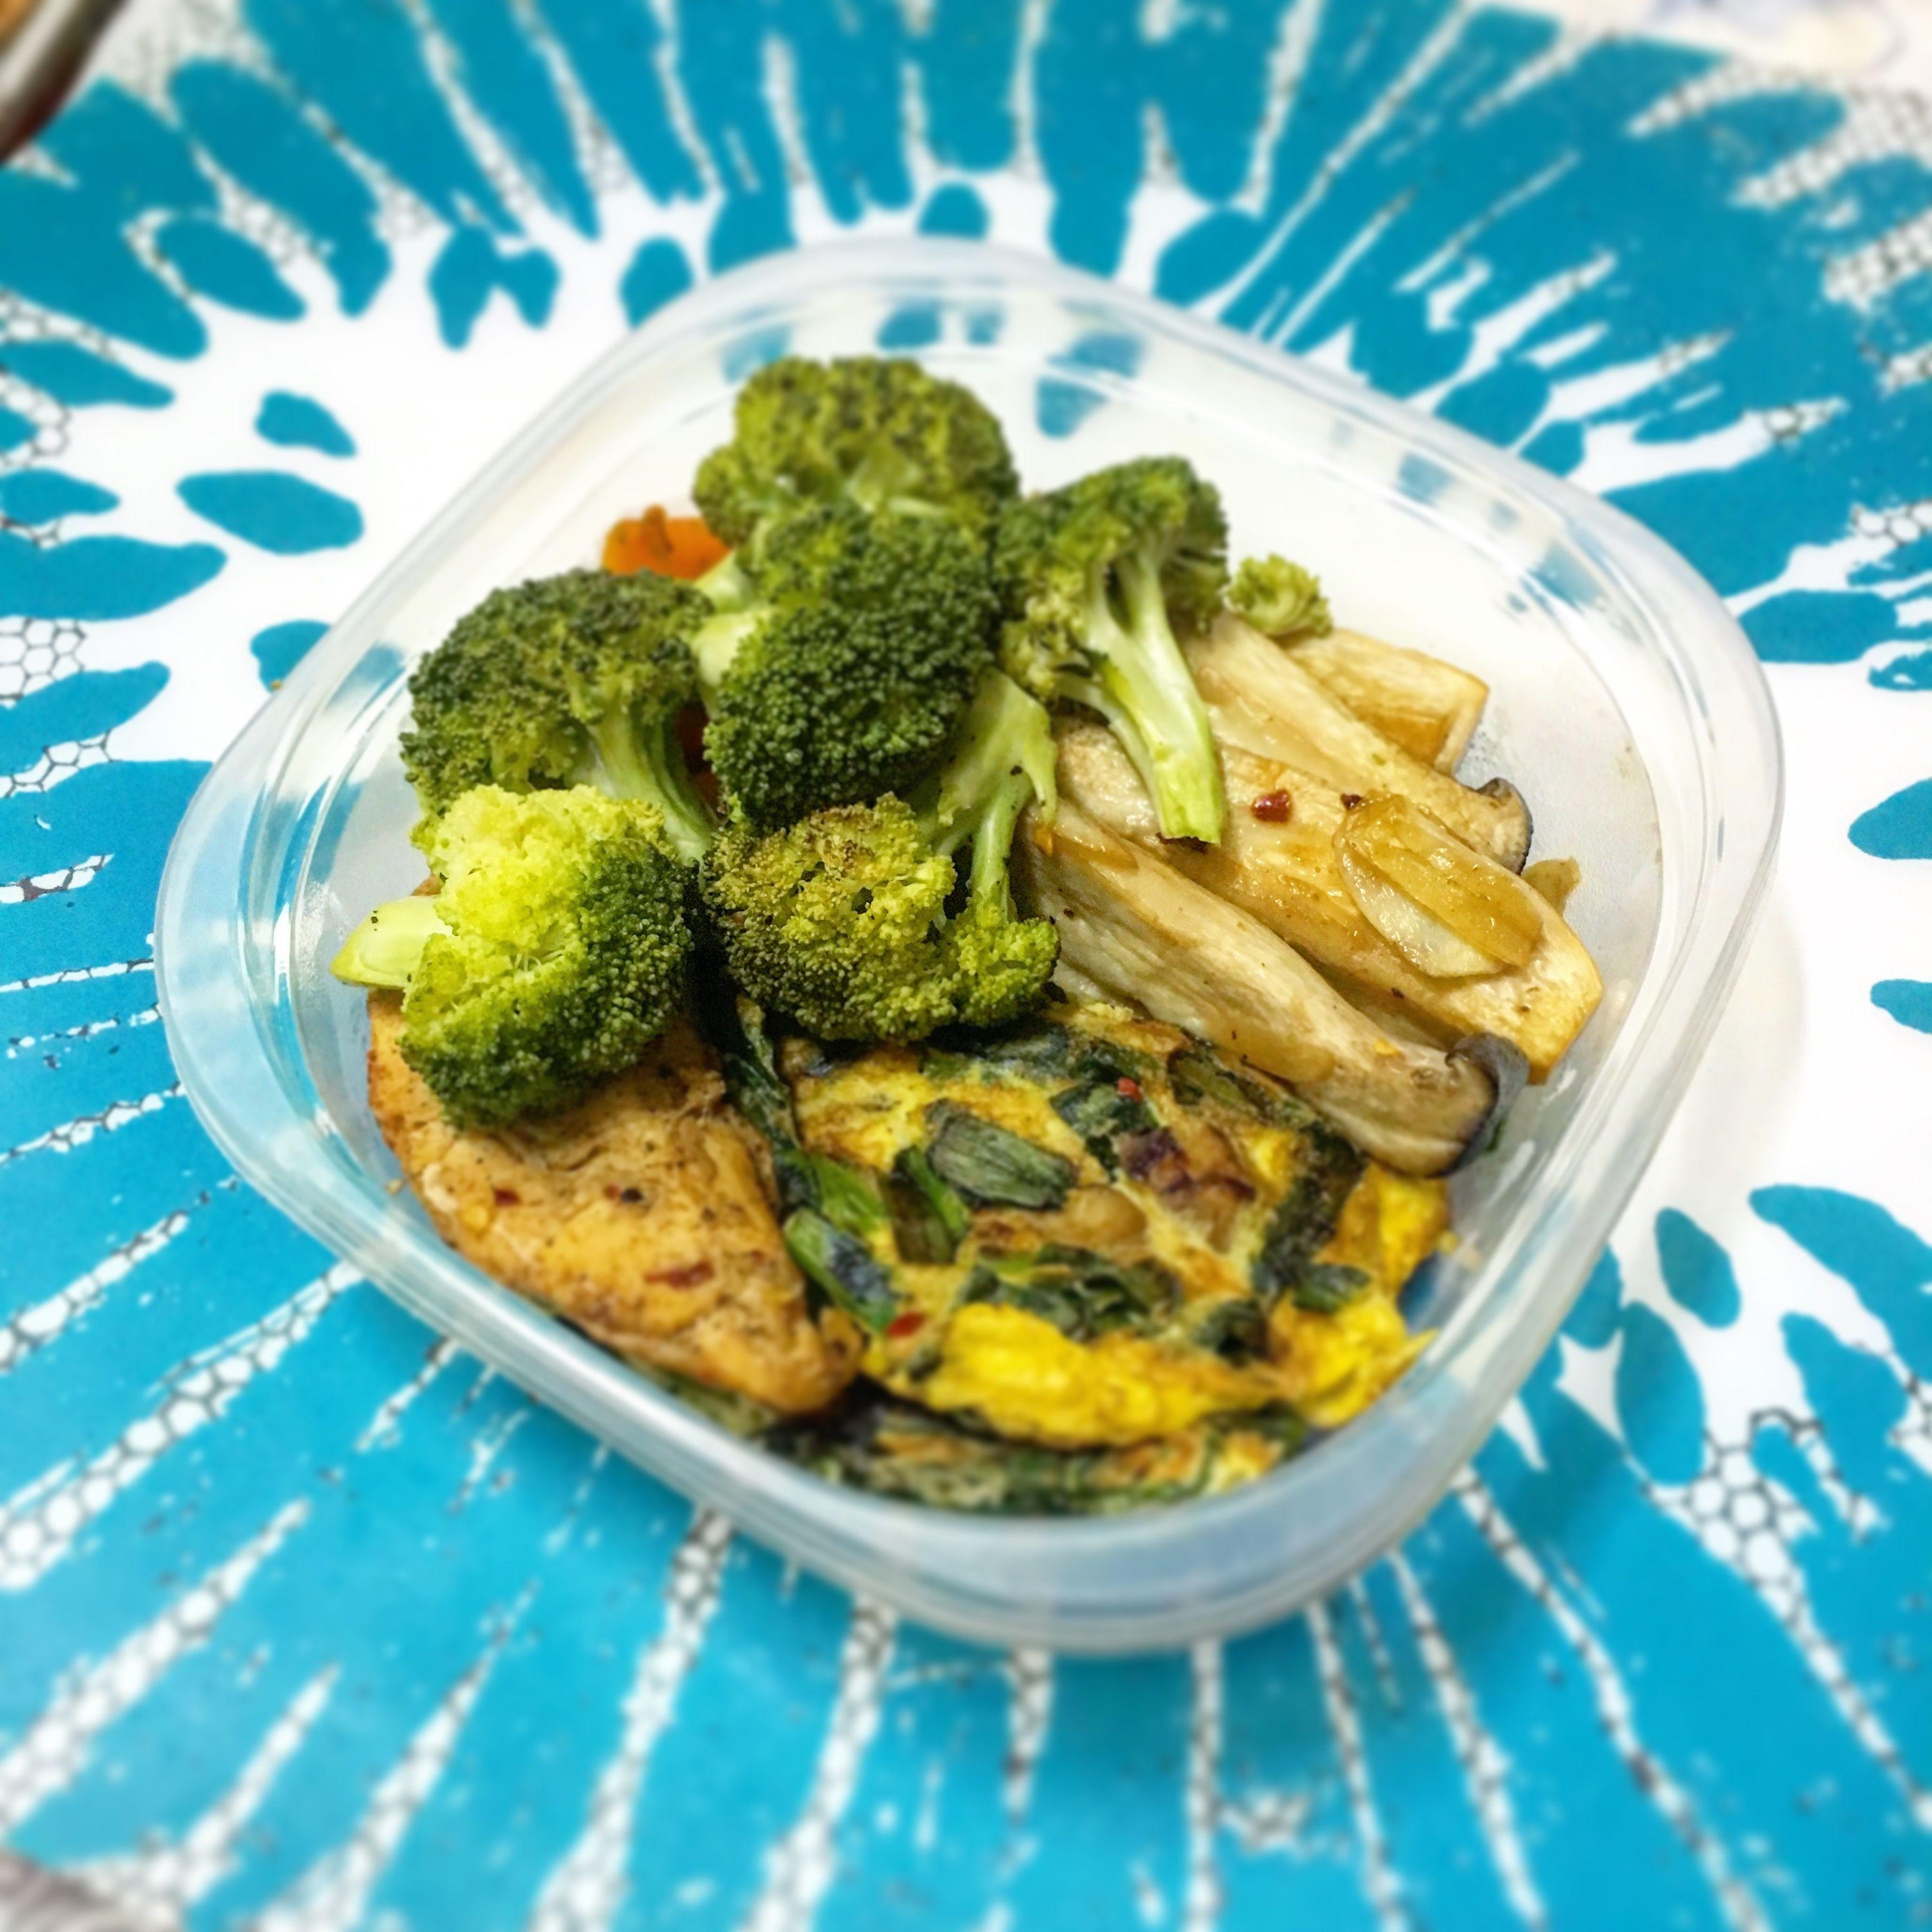 . . . . #mealprep #mealprepsunday #healthydiet #healthy #eatclean #healthylifestyle #startingover #weightloss #weightlossdiet #healthyandyummy #chickebreast #broccoli #mushroom #foodie #delicious